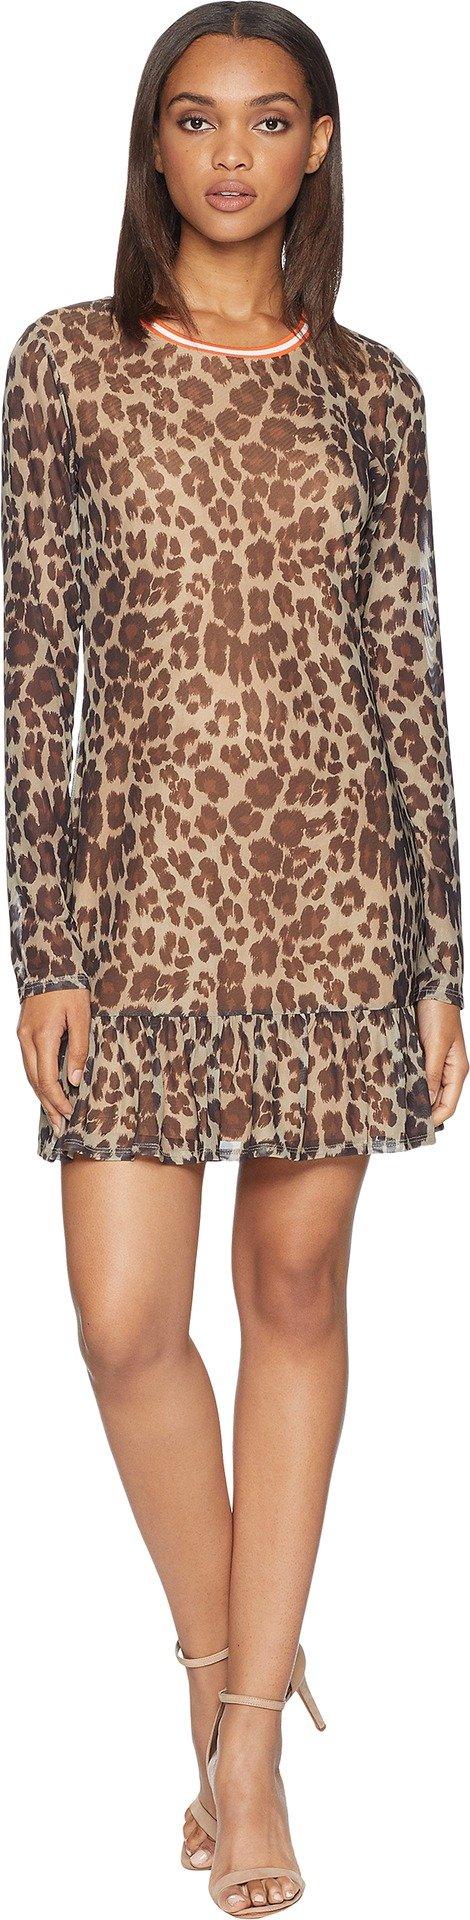 Juicy Couture Women's Leopard Print Drop Waist Bell Sleeve Dress Multi Regent Leopard Medium